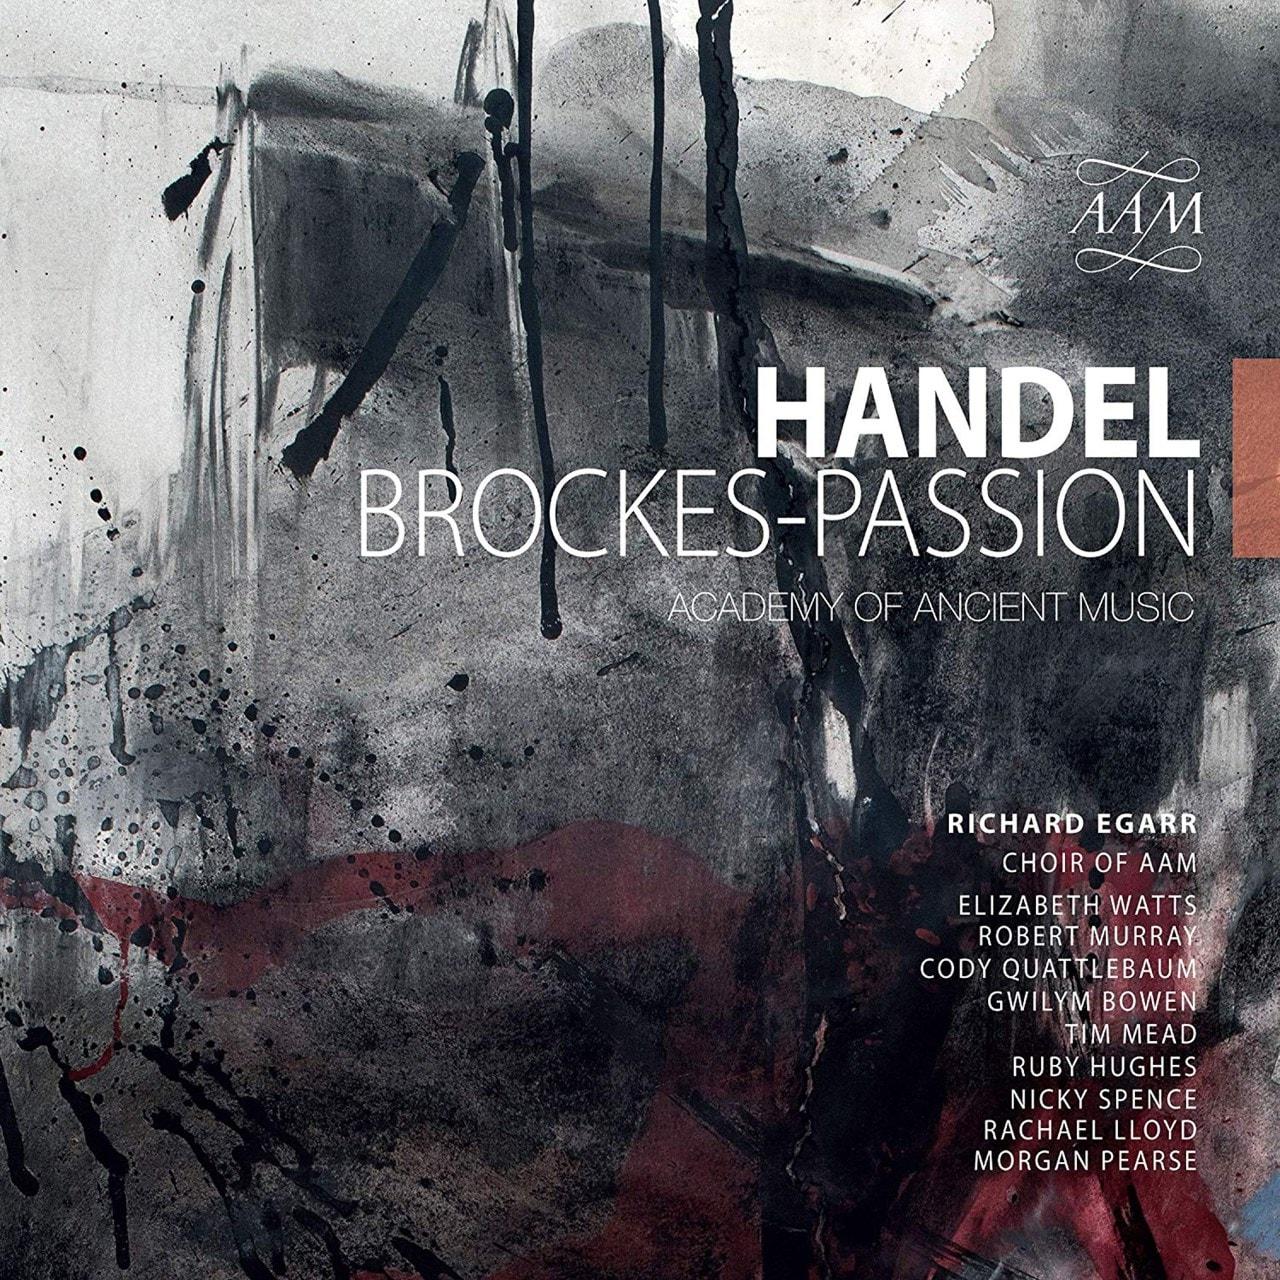 Handel: Brocks-Passion - 1